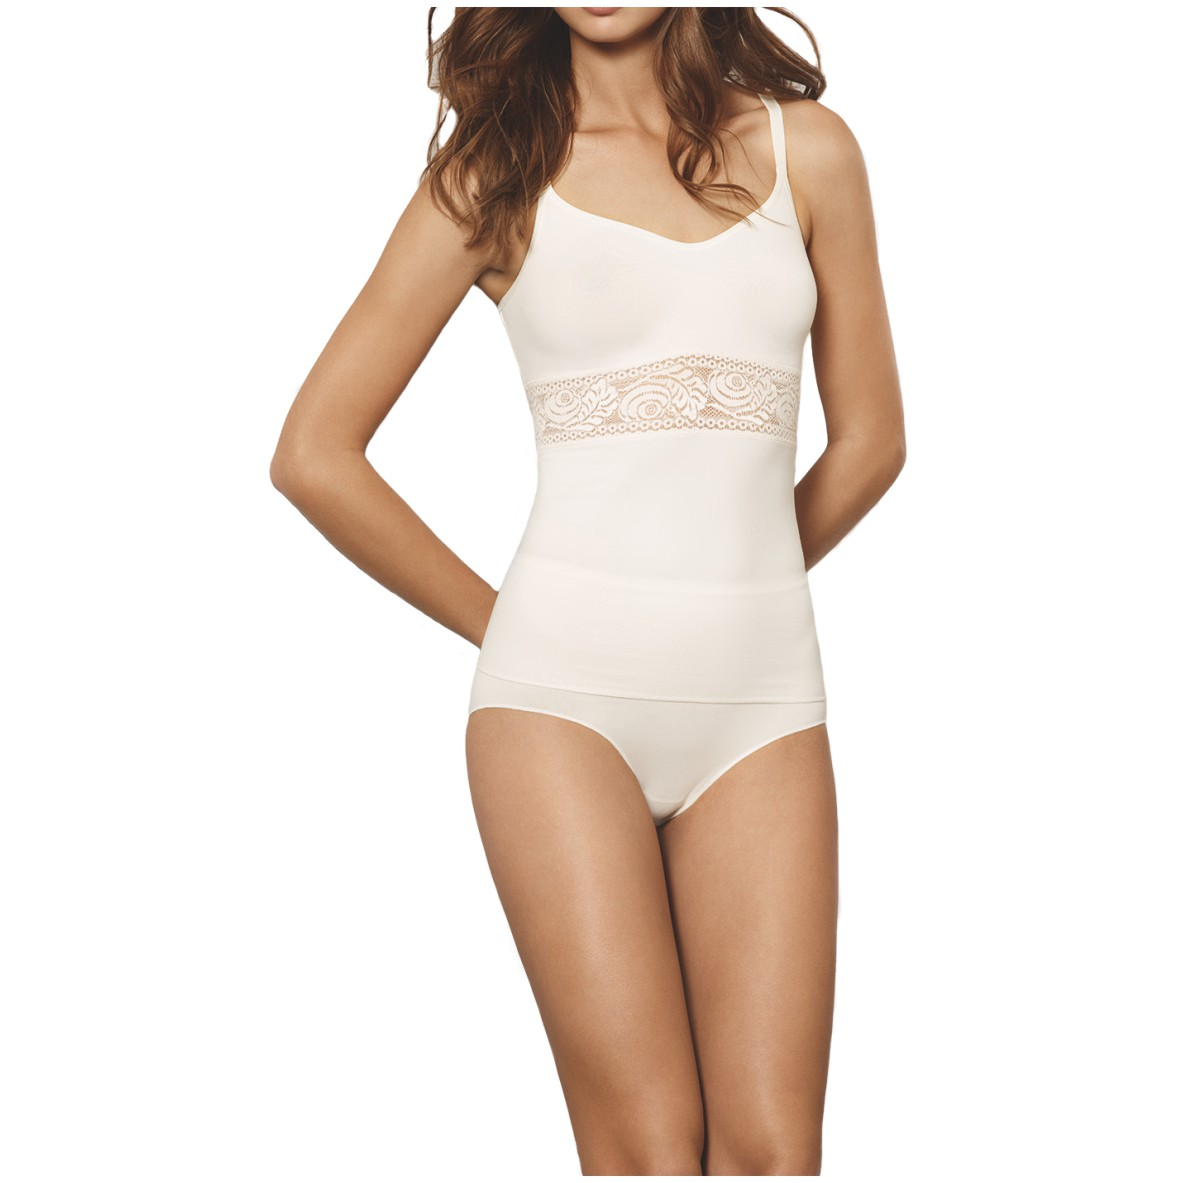 a1b128a6b8 Speidel Damen Inshape Camisole Seite 3 - Siemers Online-Shop